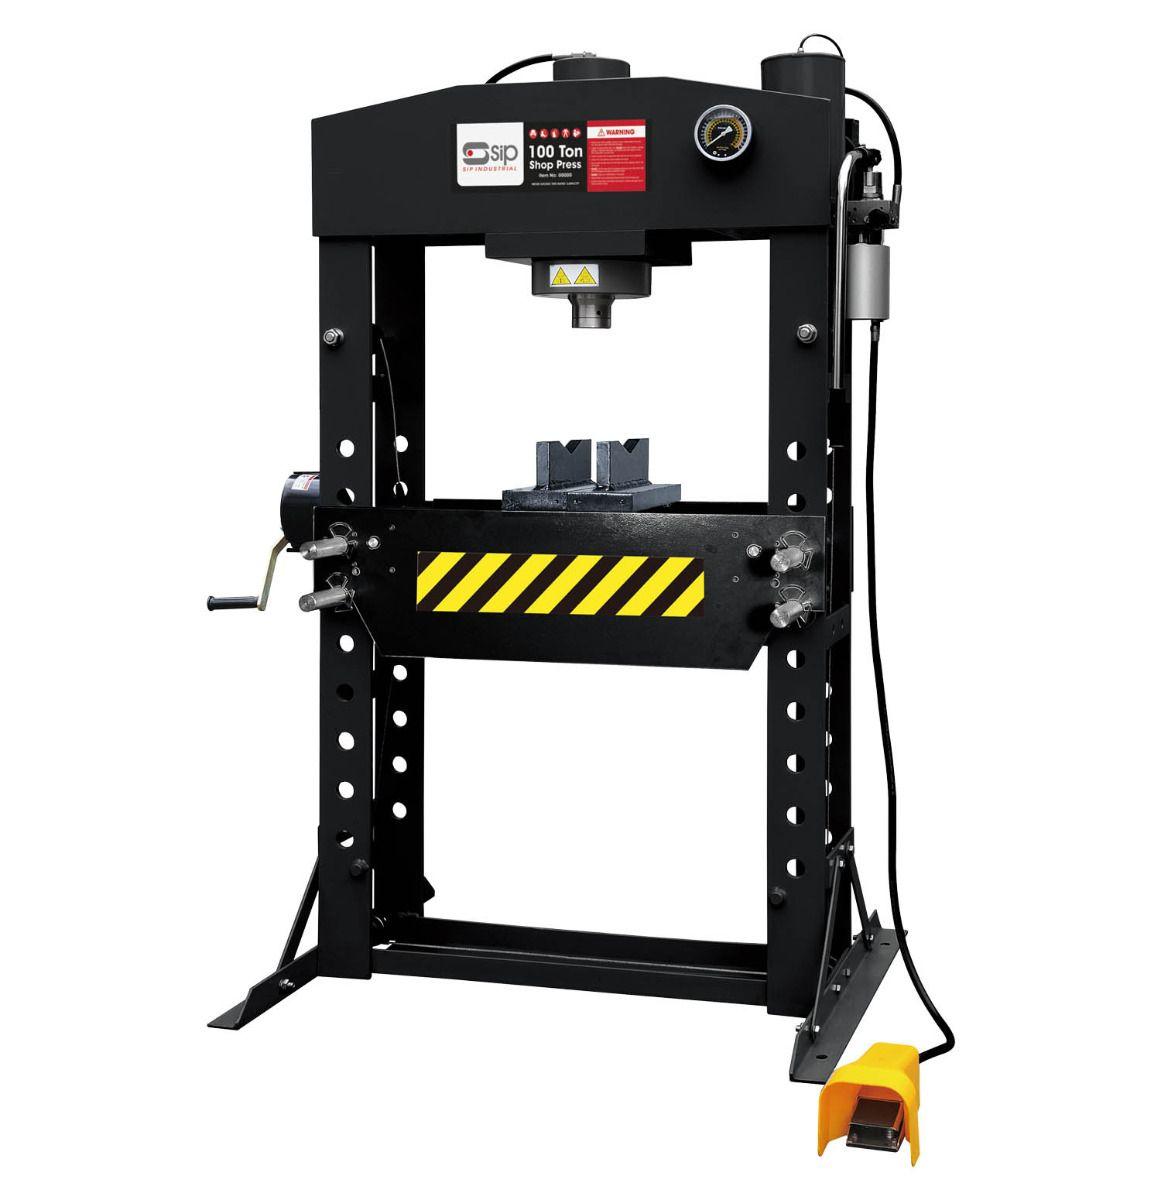 SIP 100 Ton Pneumatic Hydraulic Shop Press